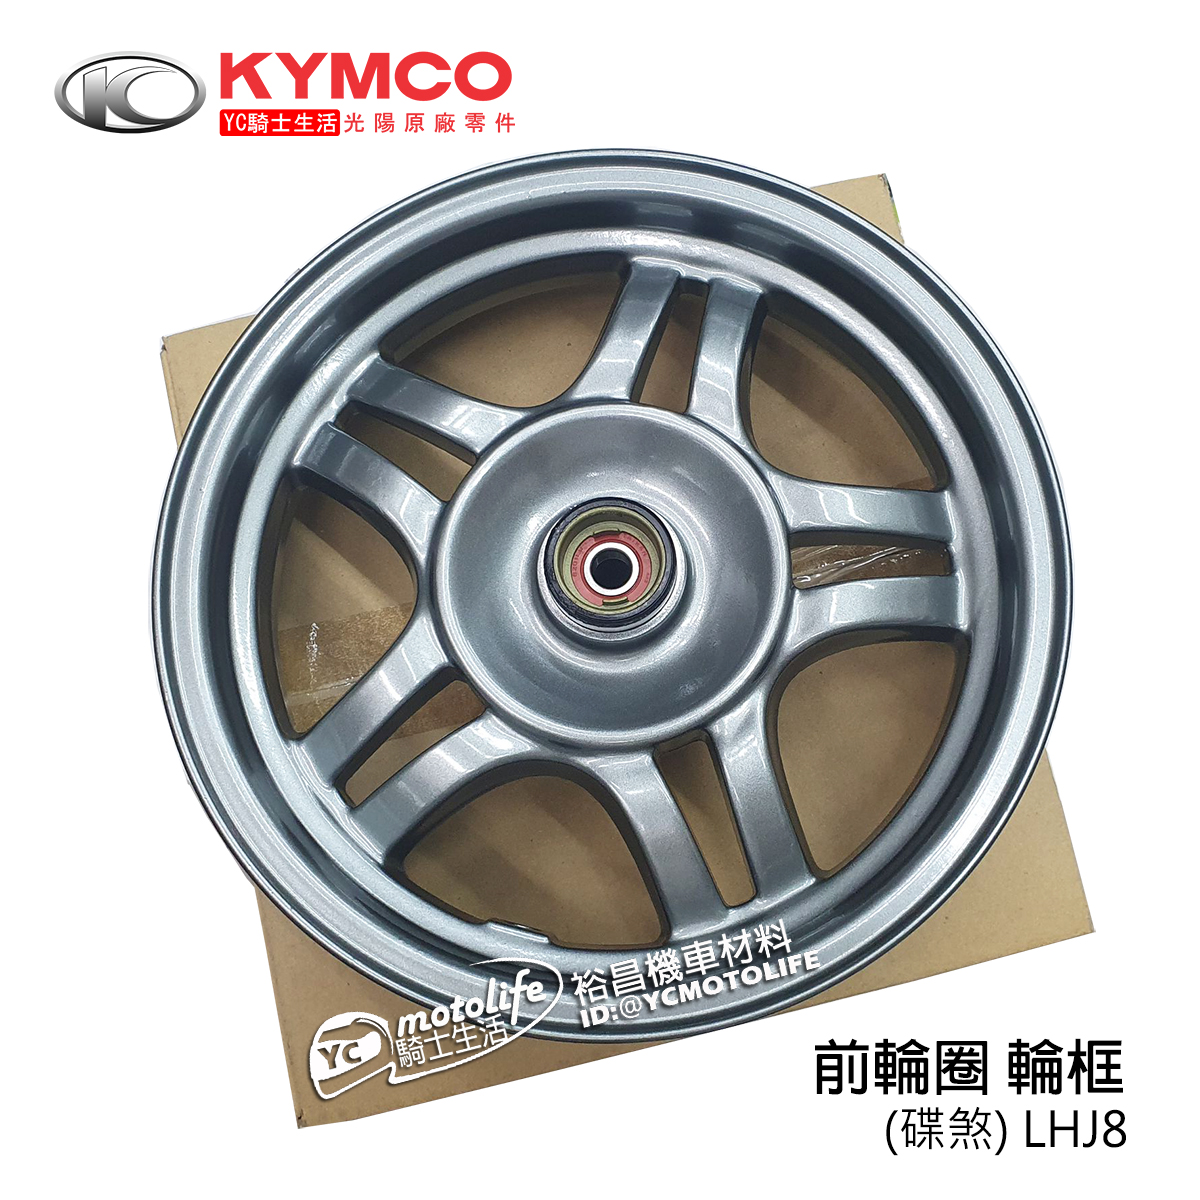 YC騎士生活_KYMCO光陽原廠 前輪框 Many 125 碟煞 前輪圈 輪框 輪圈 晶鑽銀 LHJ8 魅力 前碟輪圈